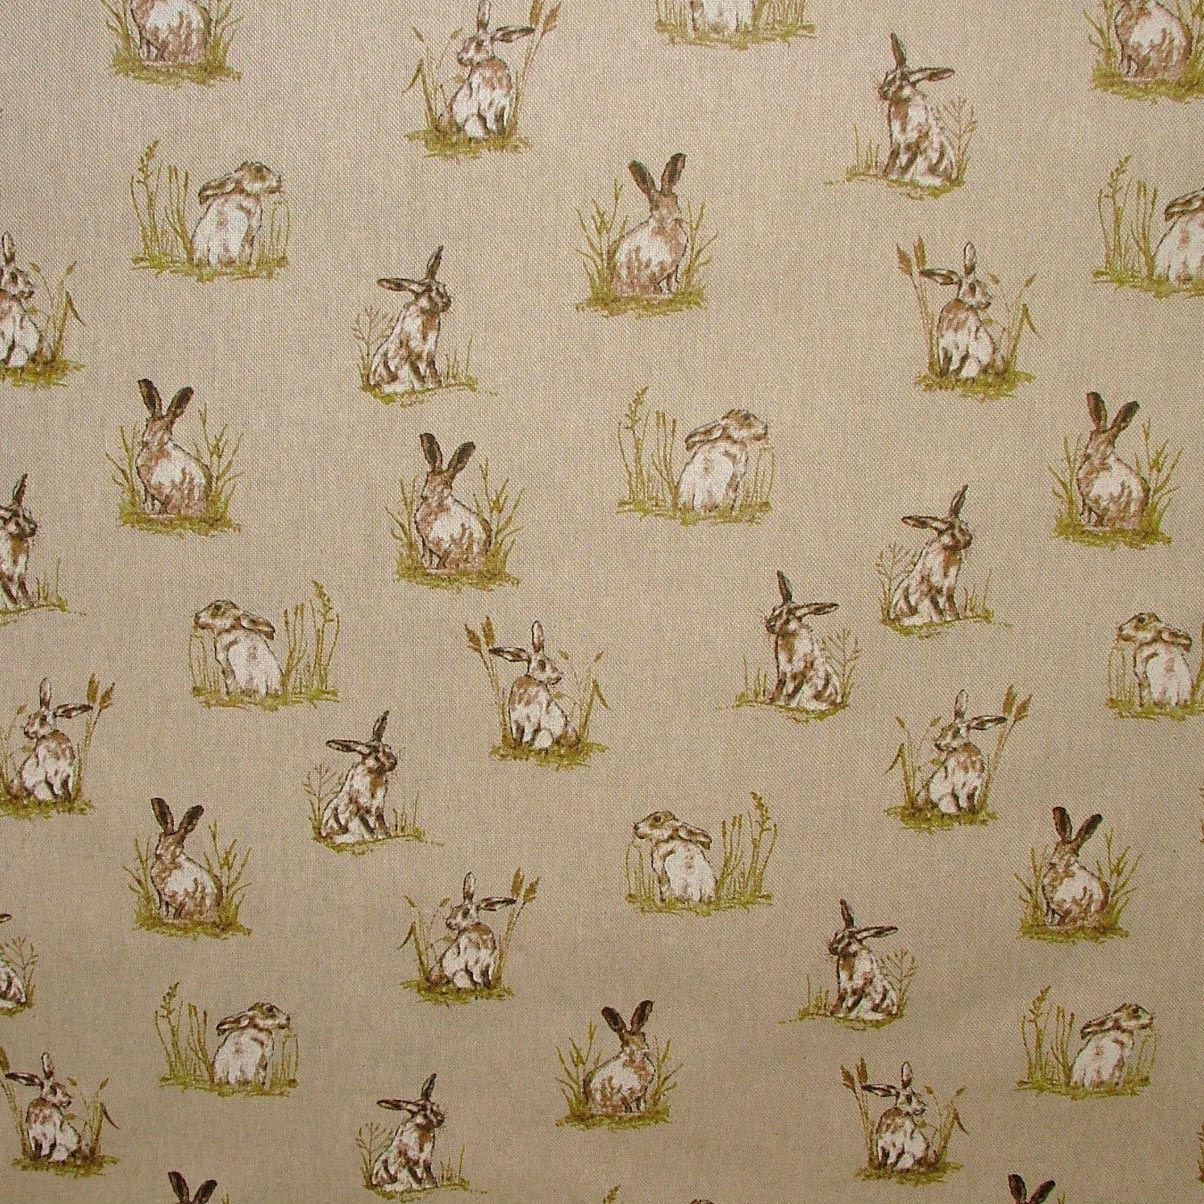 printed fabric sofa designs newport gumtree vintage linen look country side animals digital print